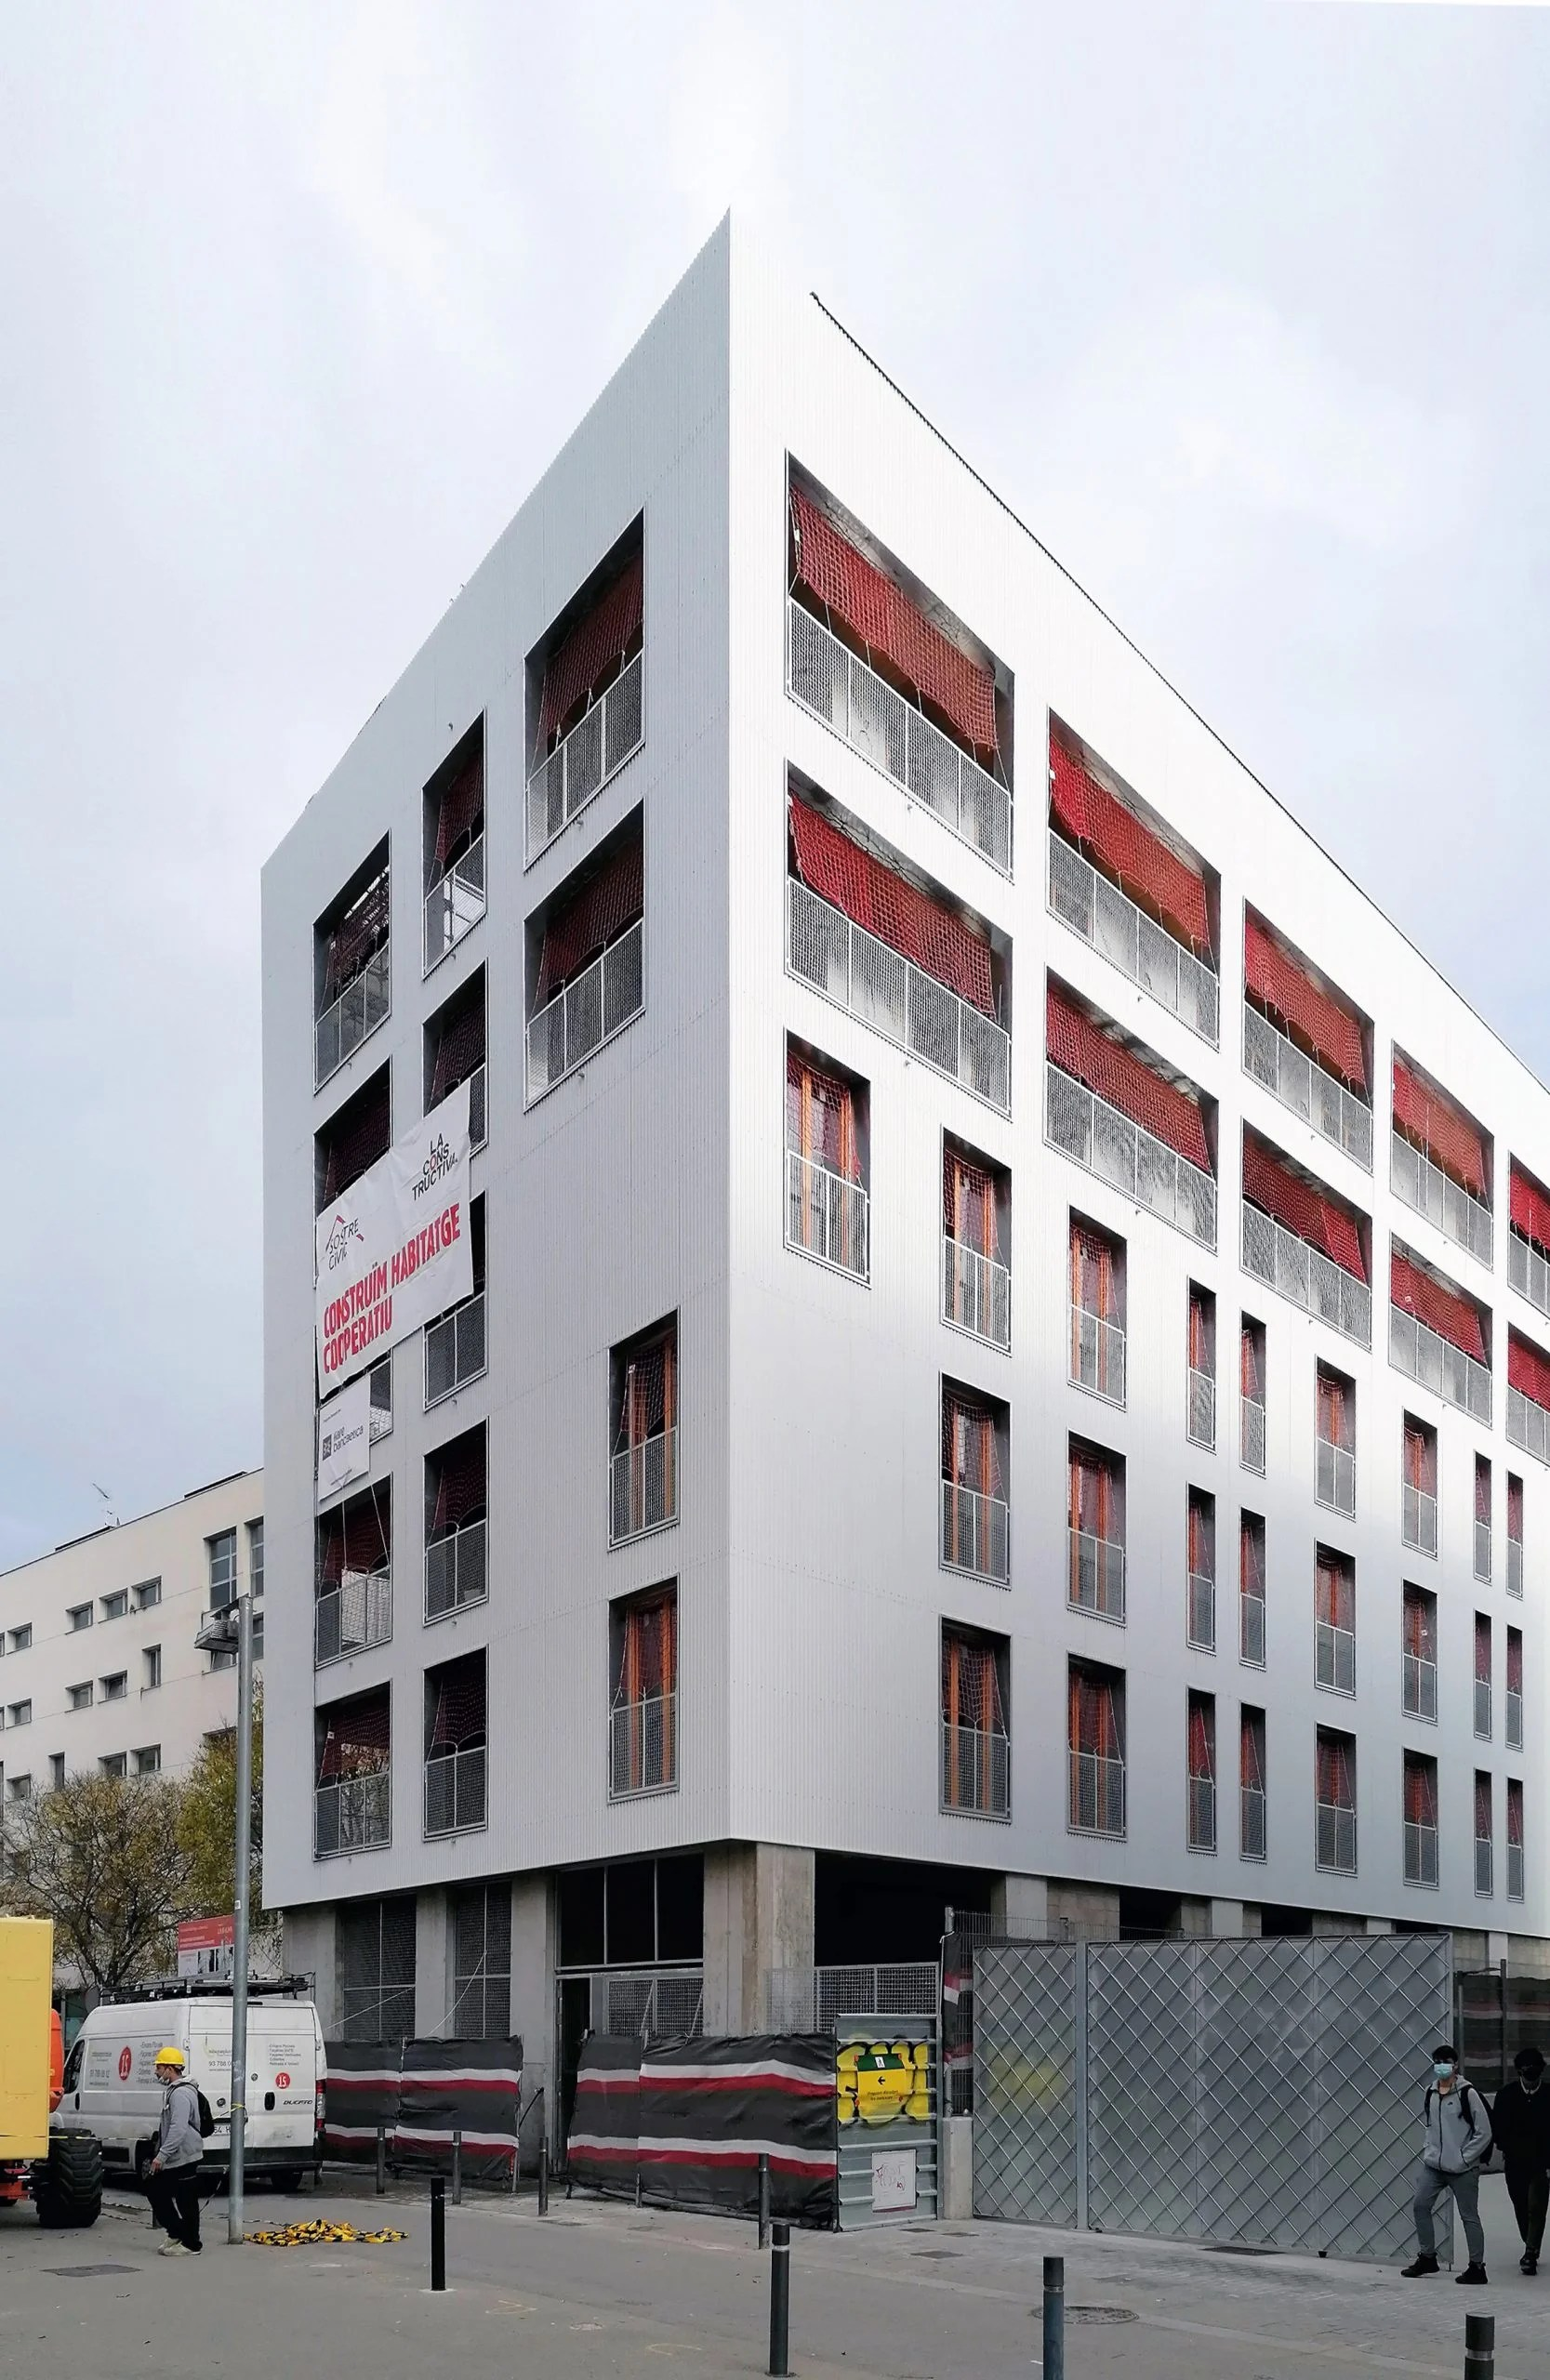 La Balma housing cooperative in Barcelona